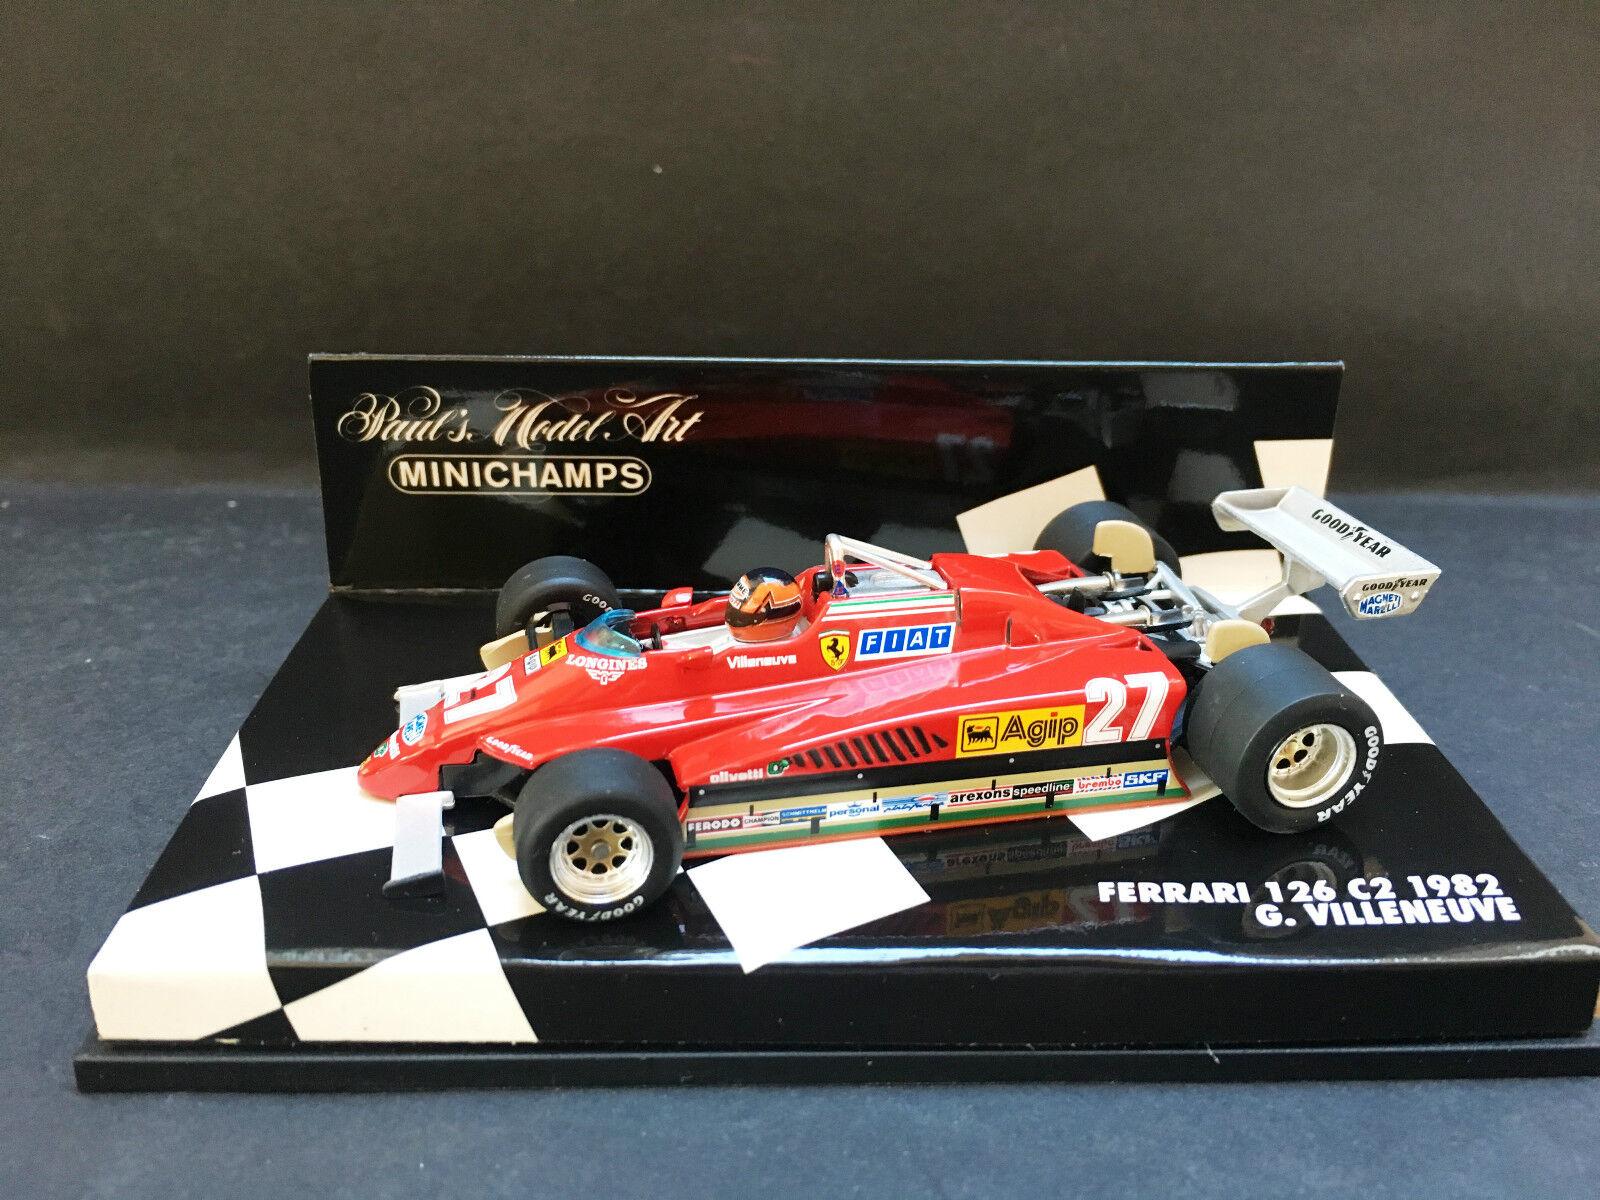 Minichamps  - Gilles Villeneuve - Ferrari - 126C2 - 1 43 - 1982  acheter une marque